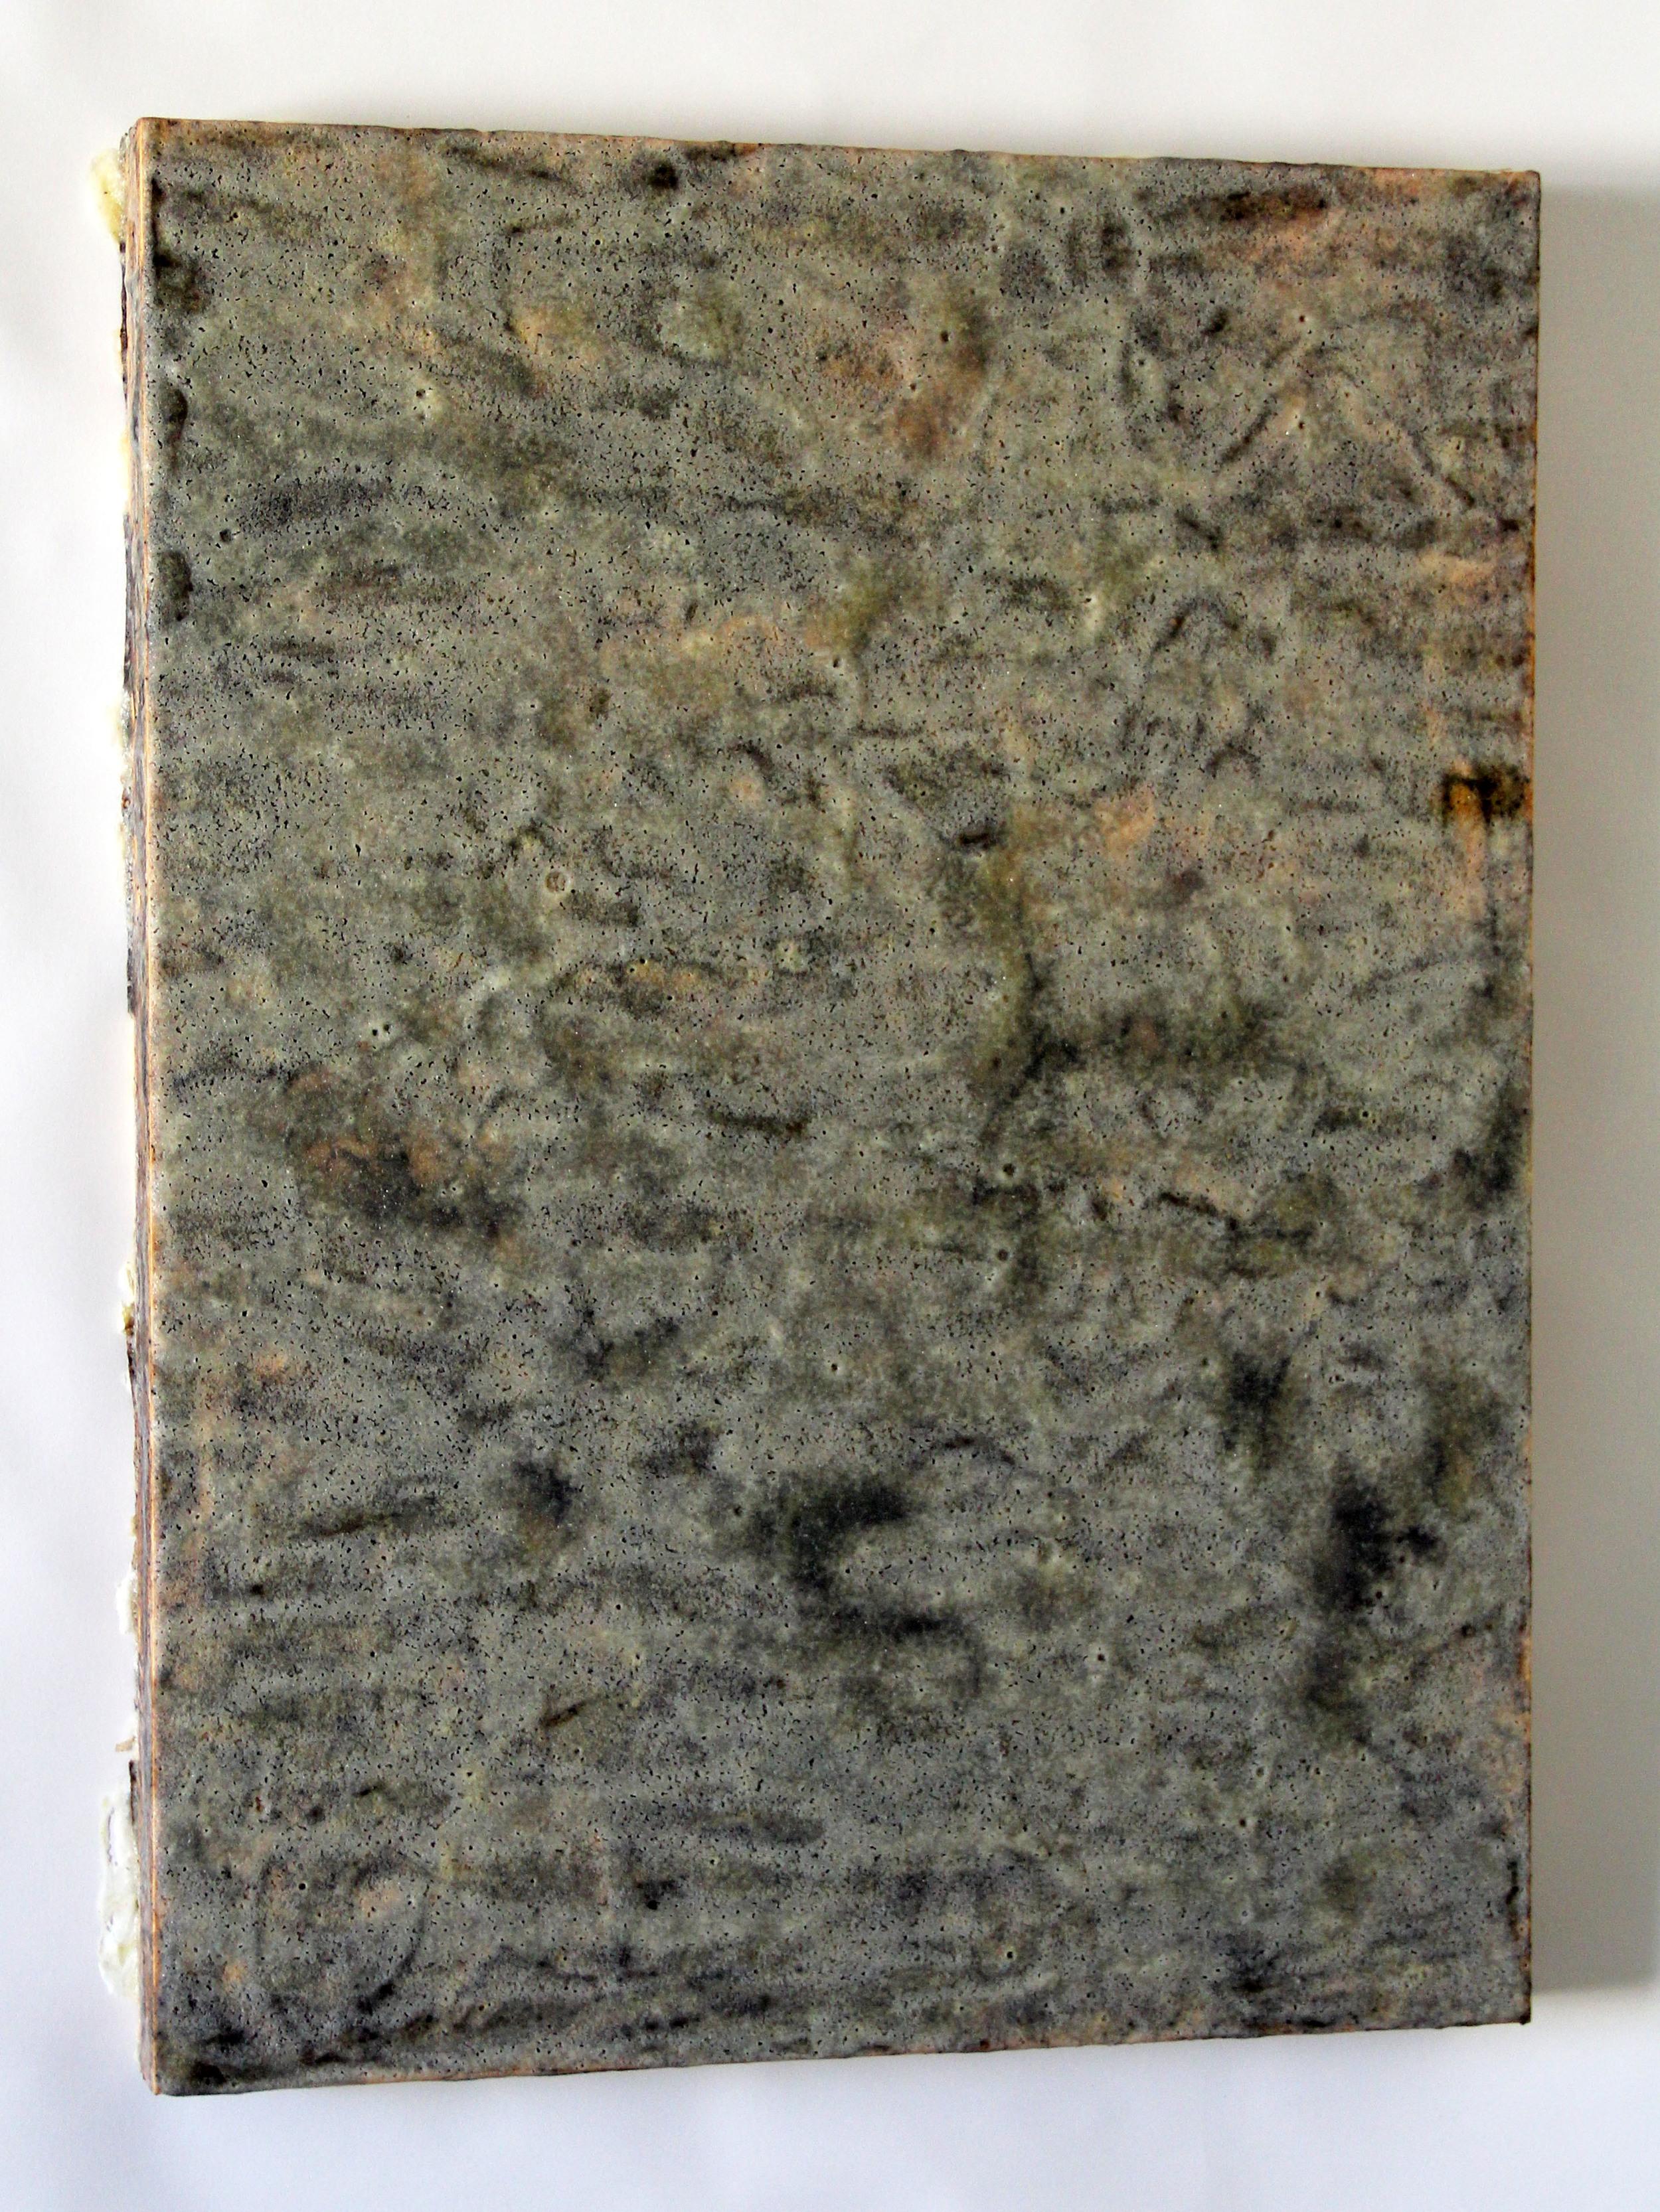 crystallization series32014 salt, borax, yellow dock, turmeric, acrylic on wood 24 x 18 x 1.5 inches